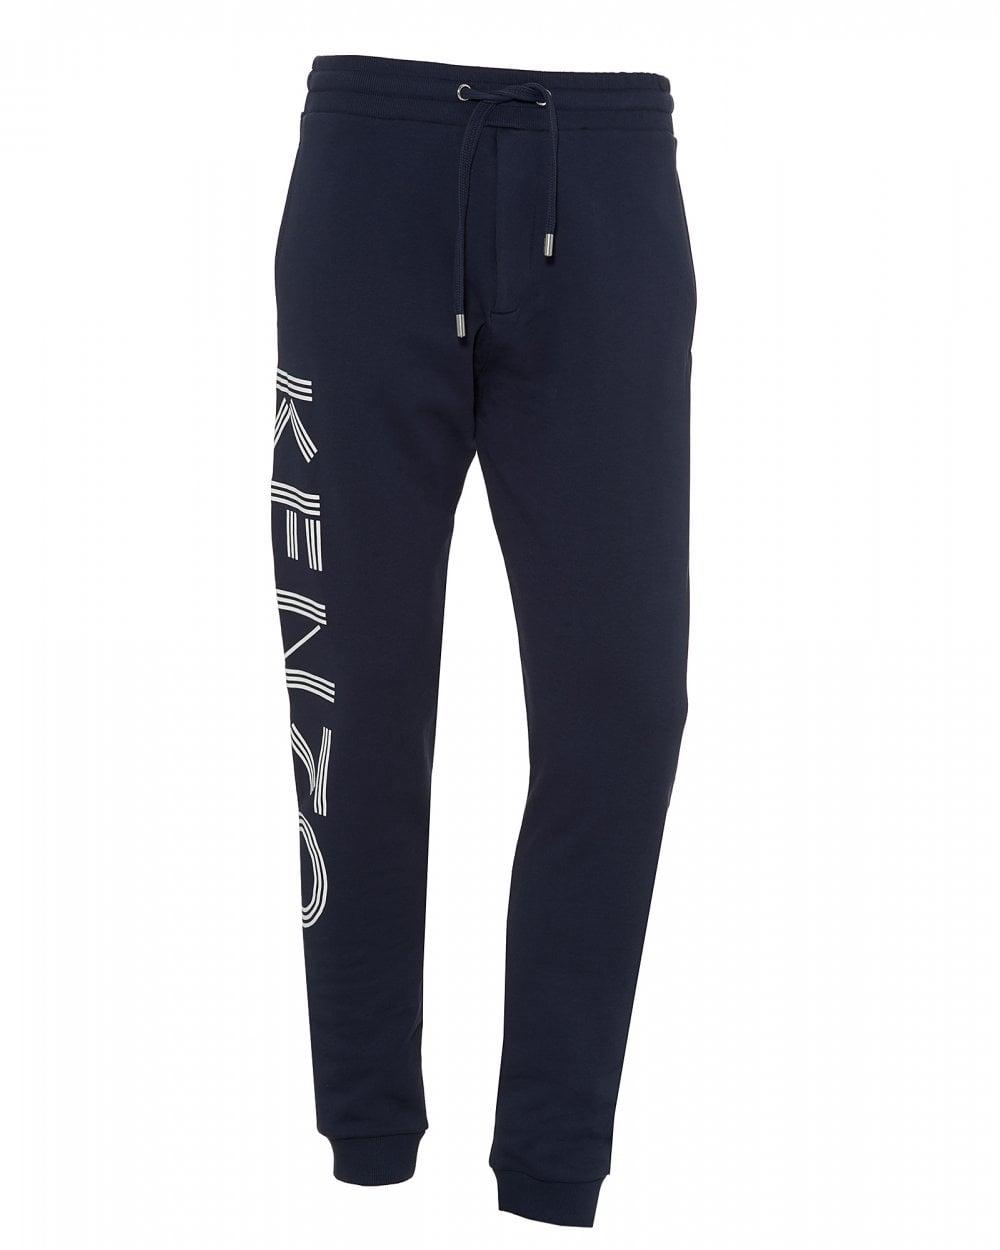 d5bd2fc2 Kenzo Mens Leg Logo Joggers, Ink Blue Sweatpants